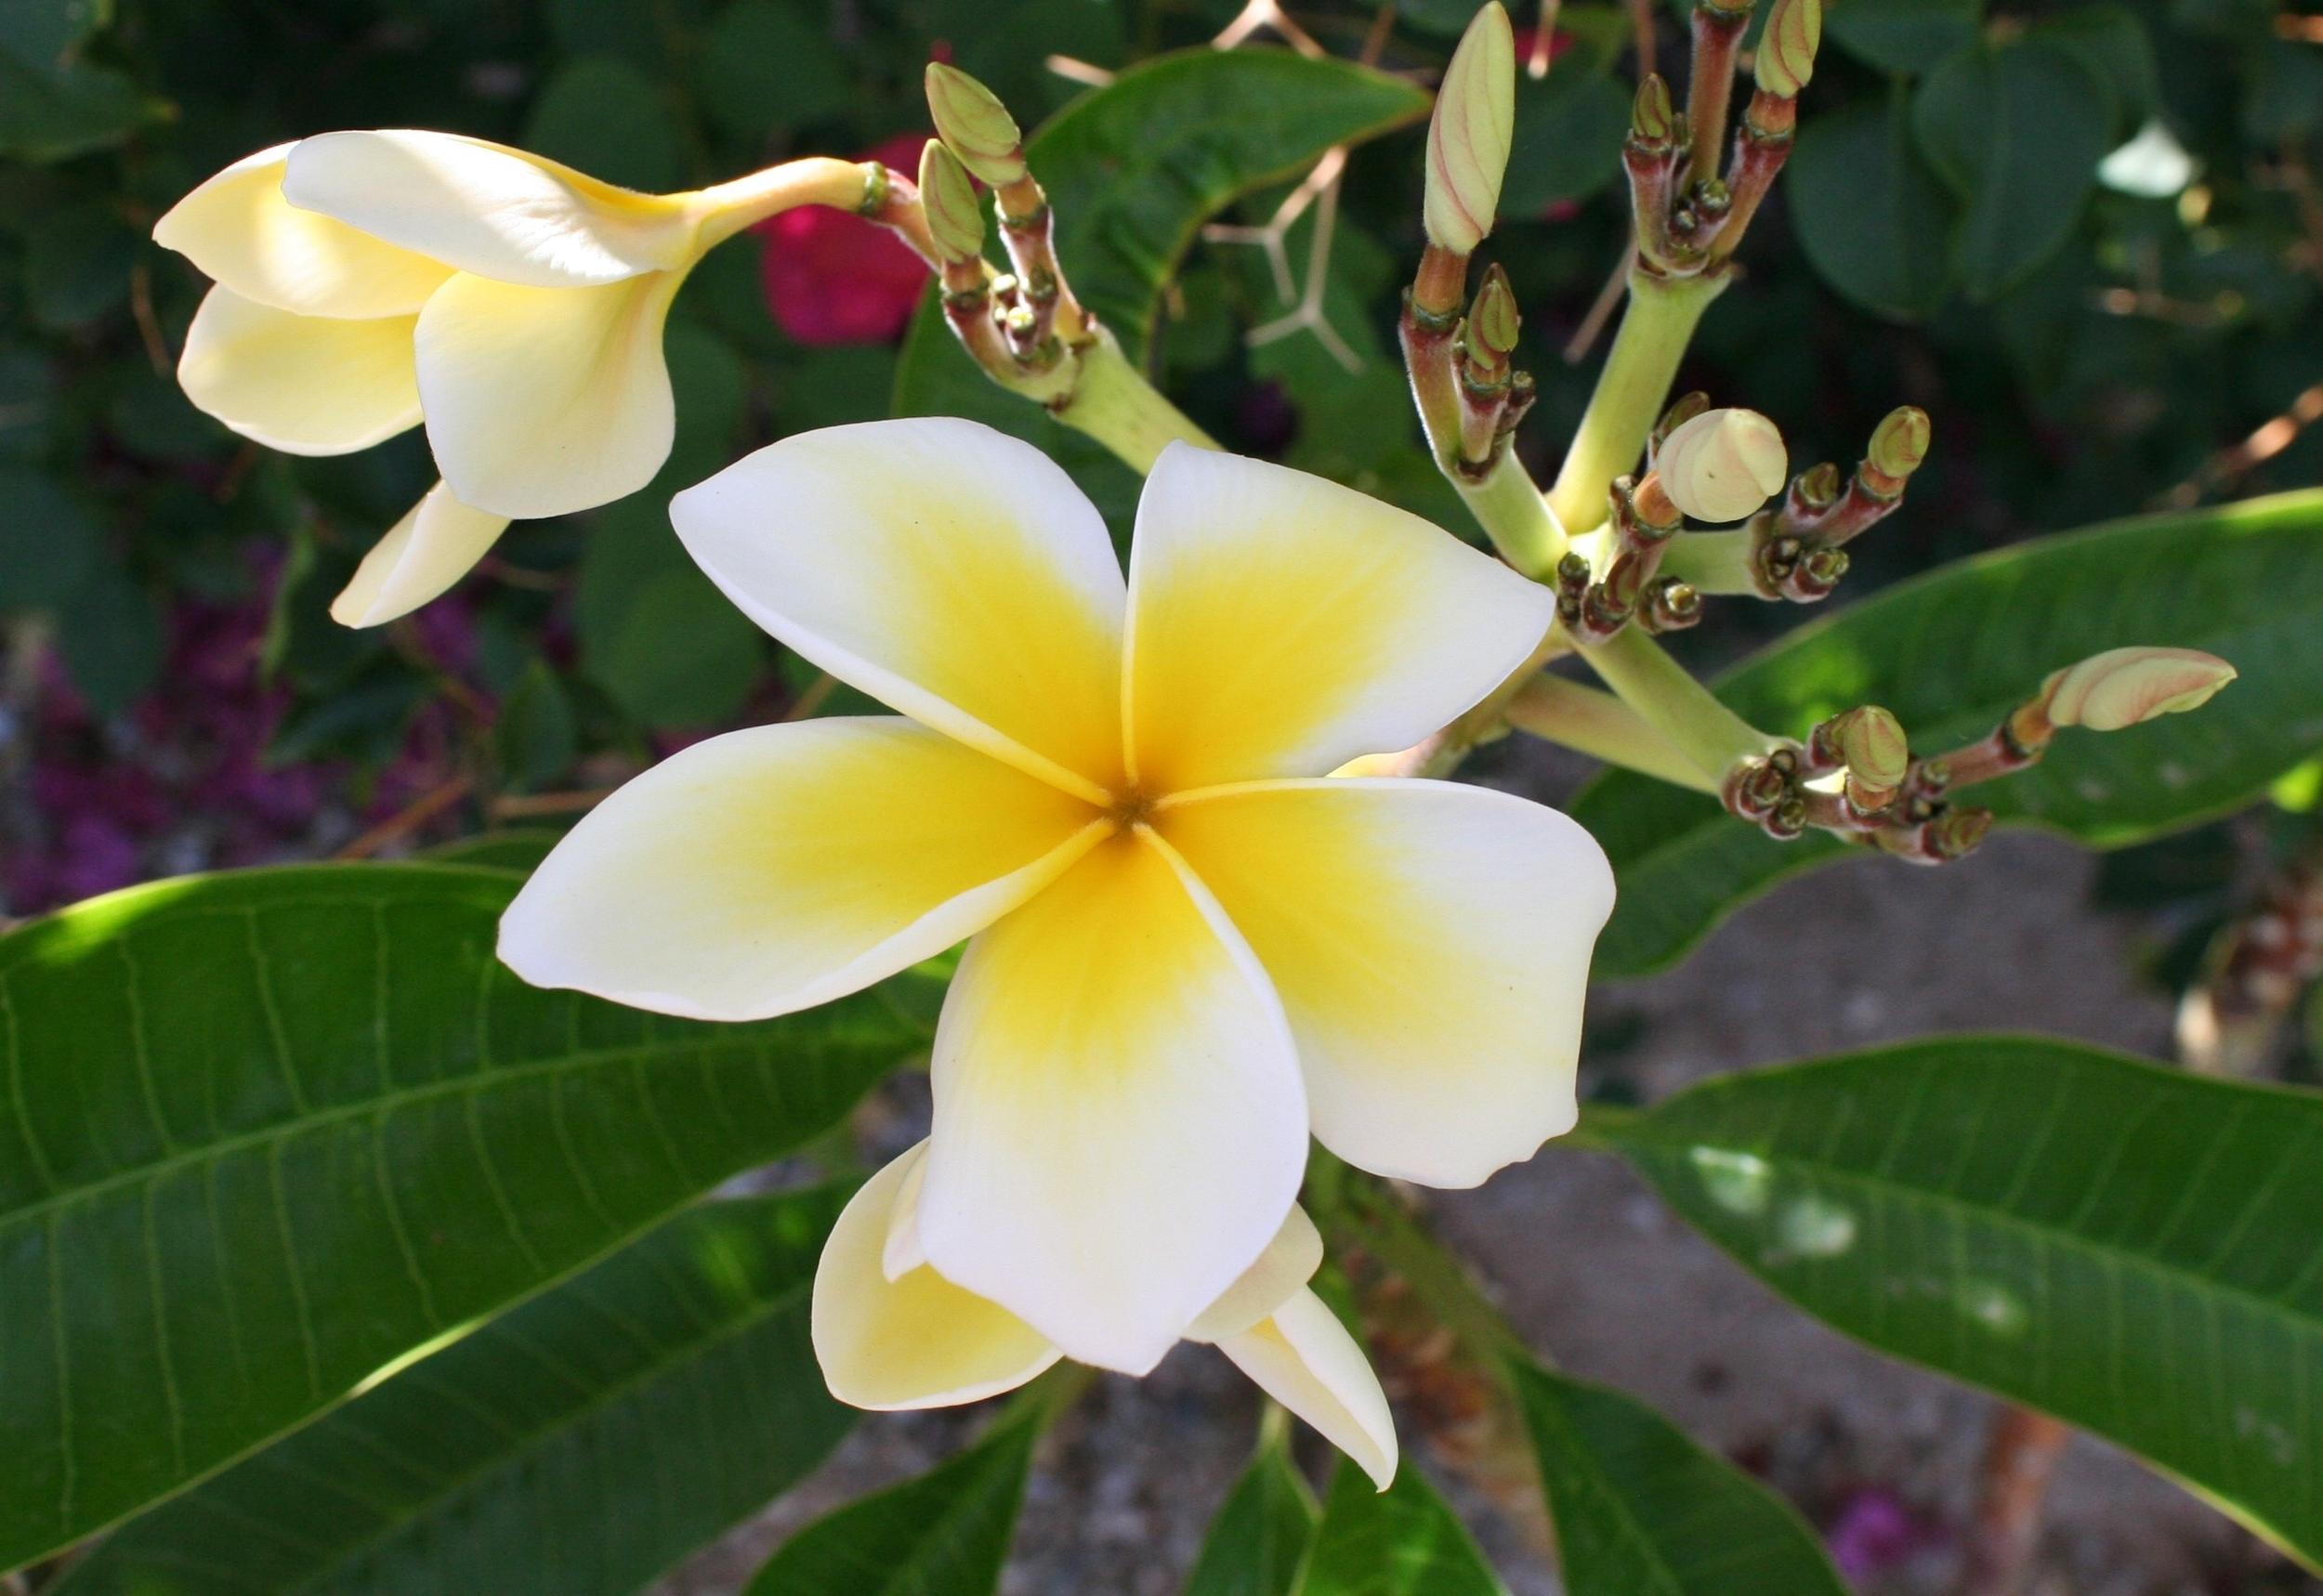 Celadine plumeria Arizona